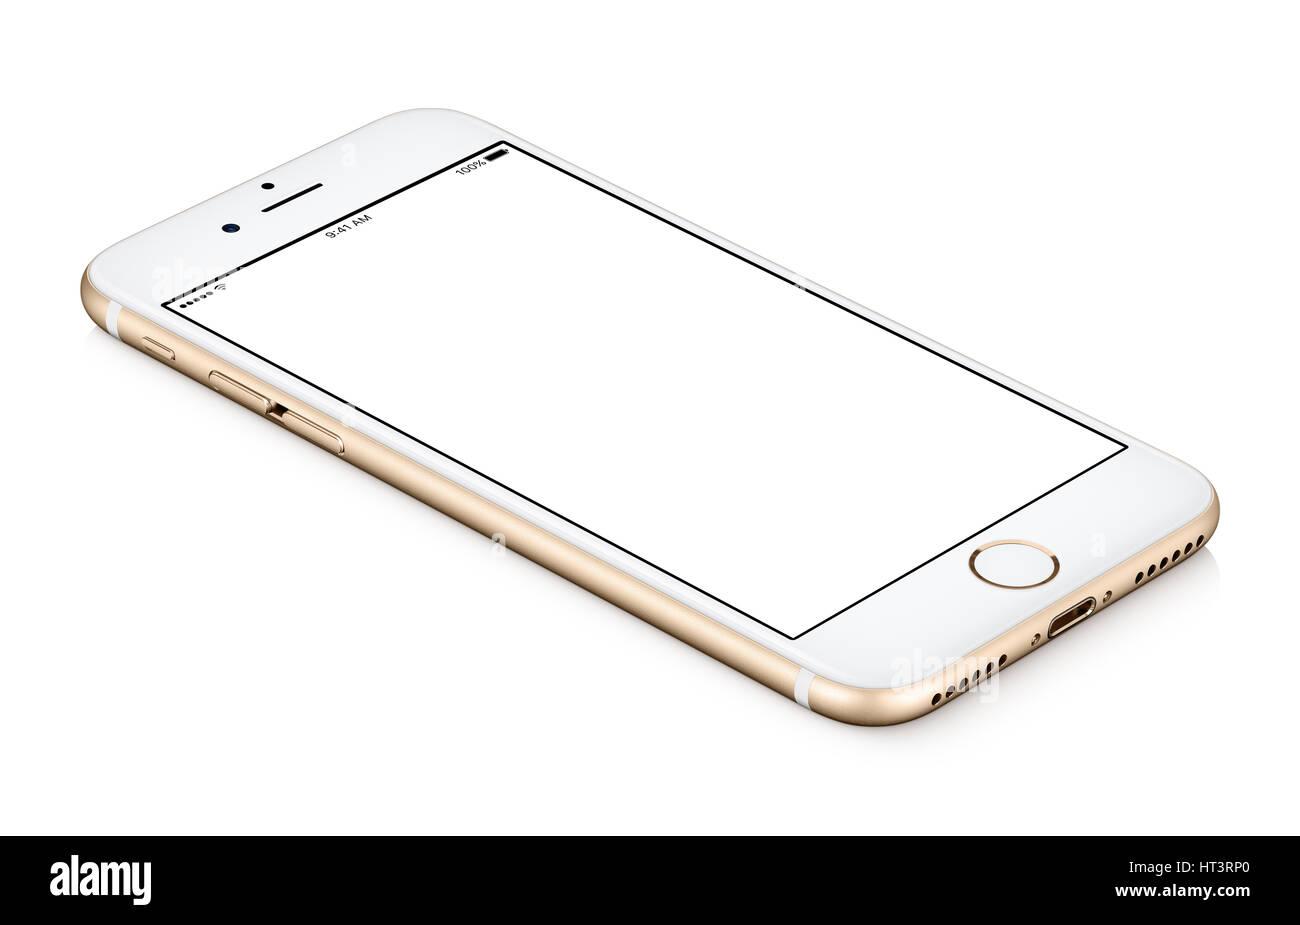 Gold mobile Smartphone mock-up gegen den Uhrzeigersinn gedrehten liegt auf der Oberfläche mit unbelegten Schirm Stockbild